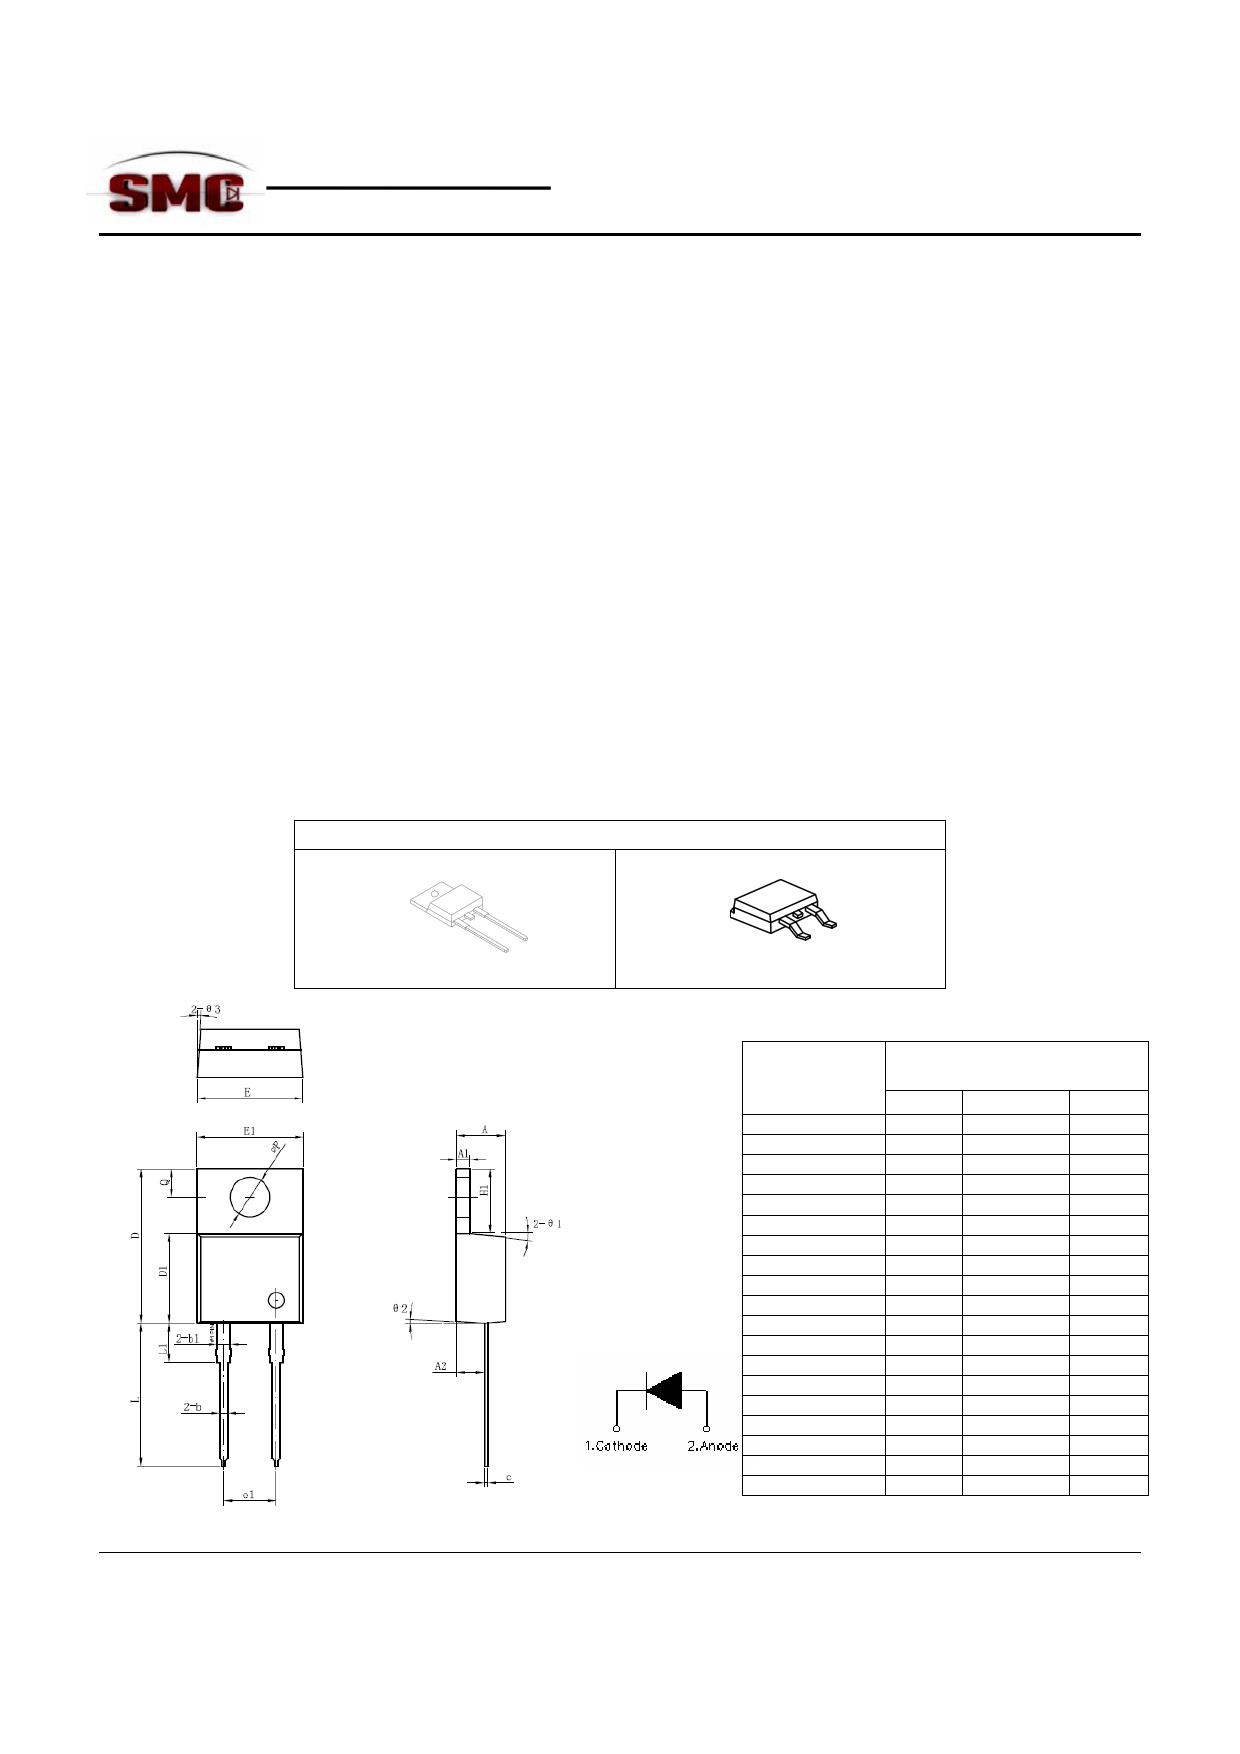 10TQ035 Datasheet, 10TQ035 PDF,ピン配置, 機能